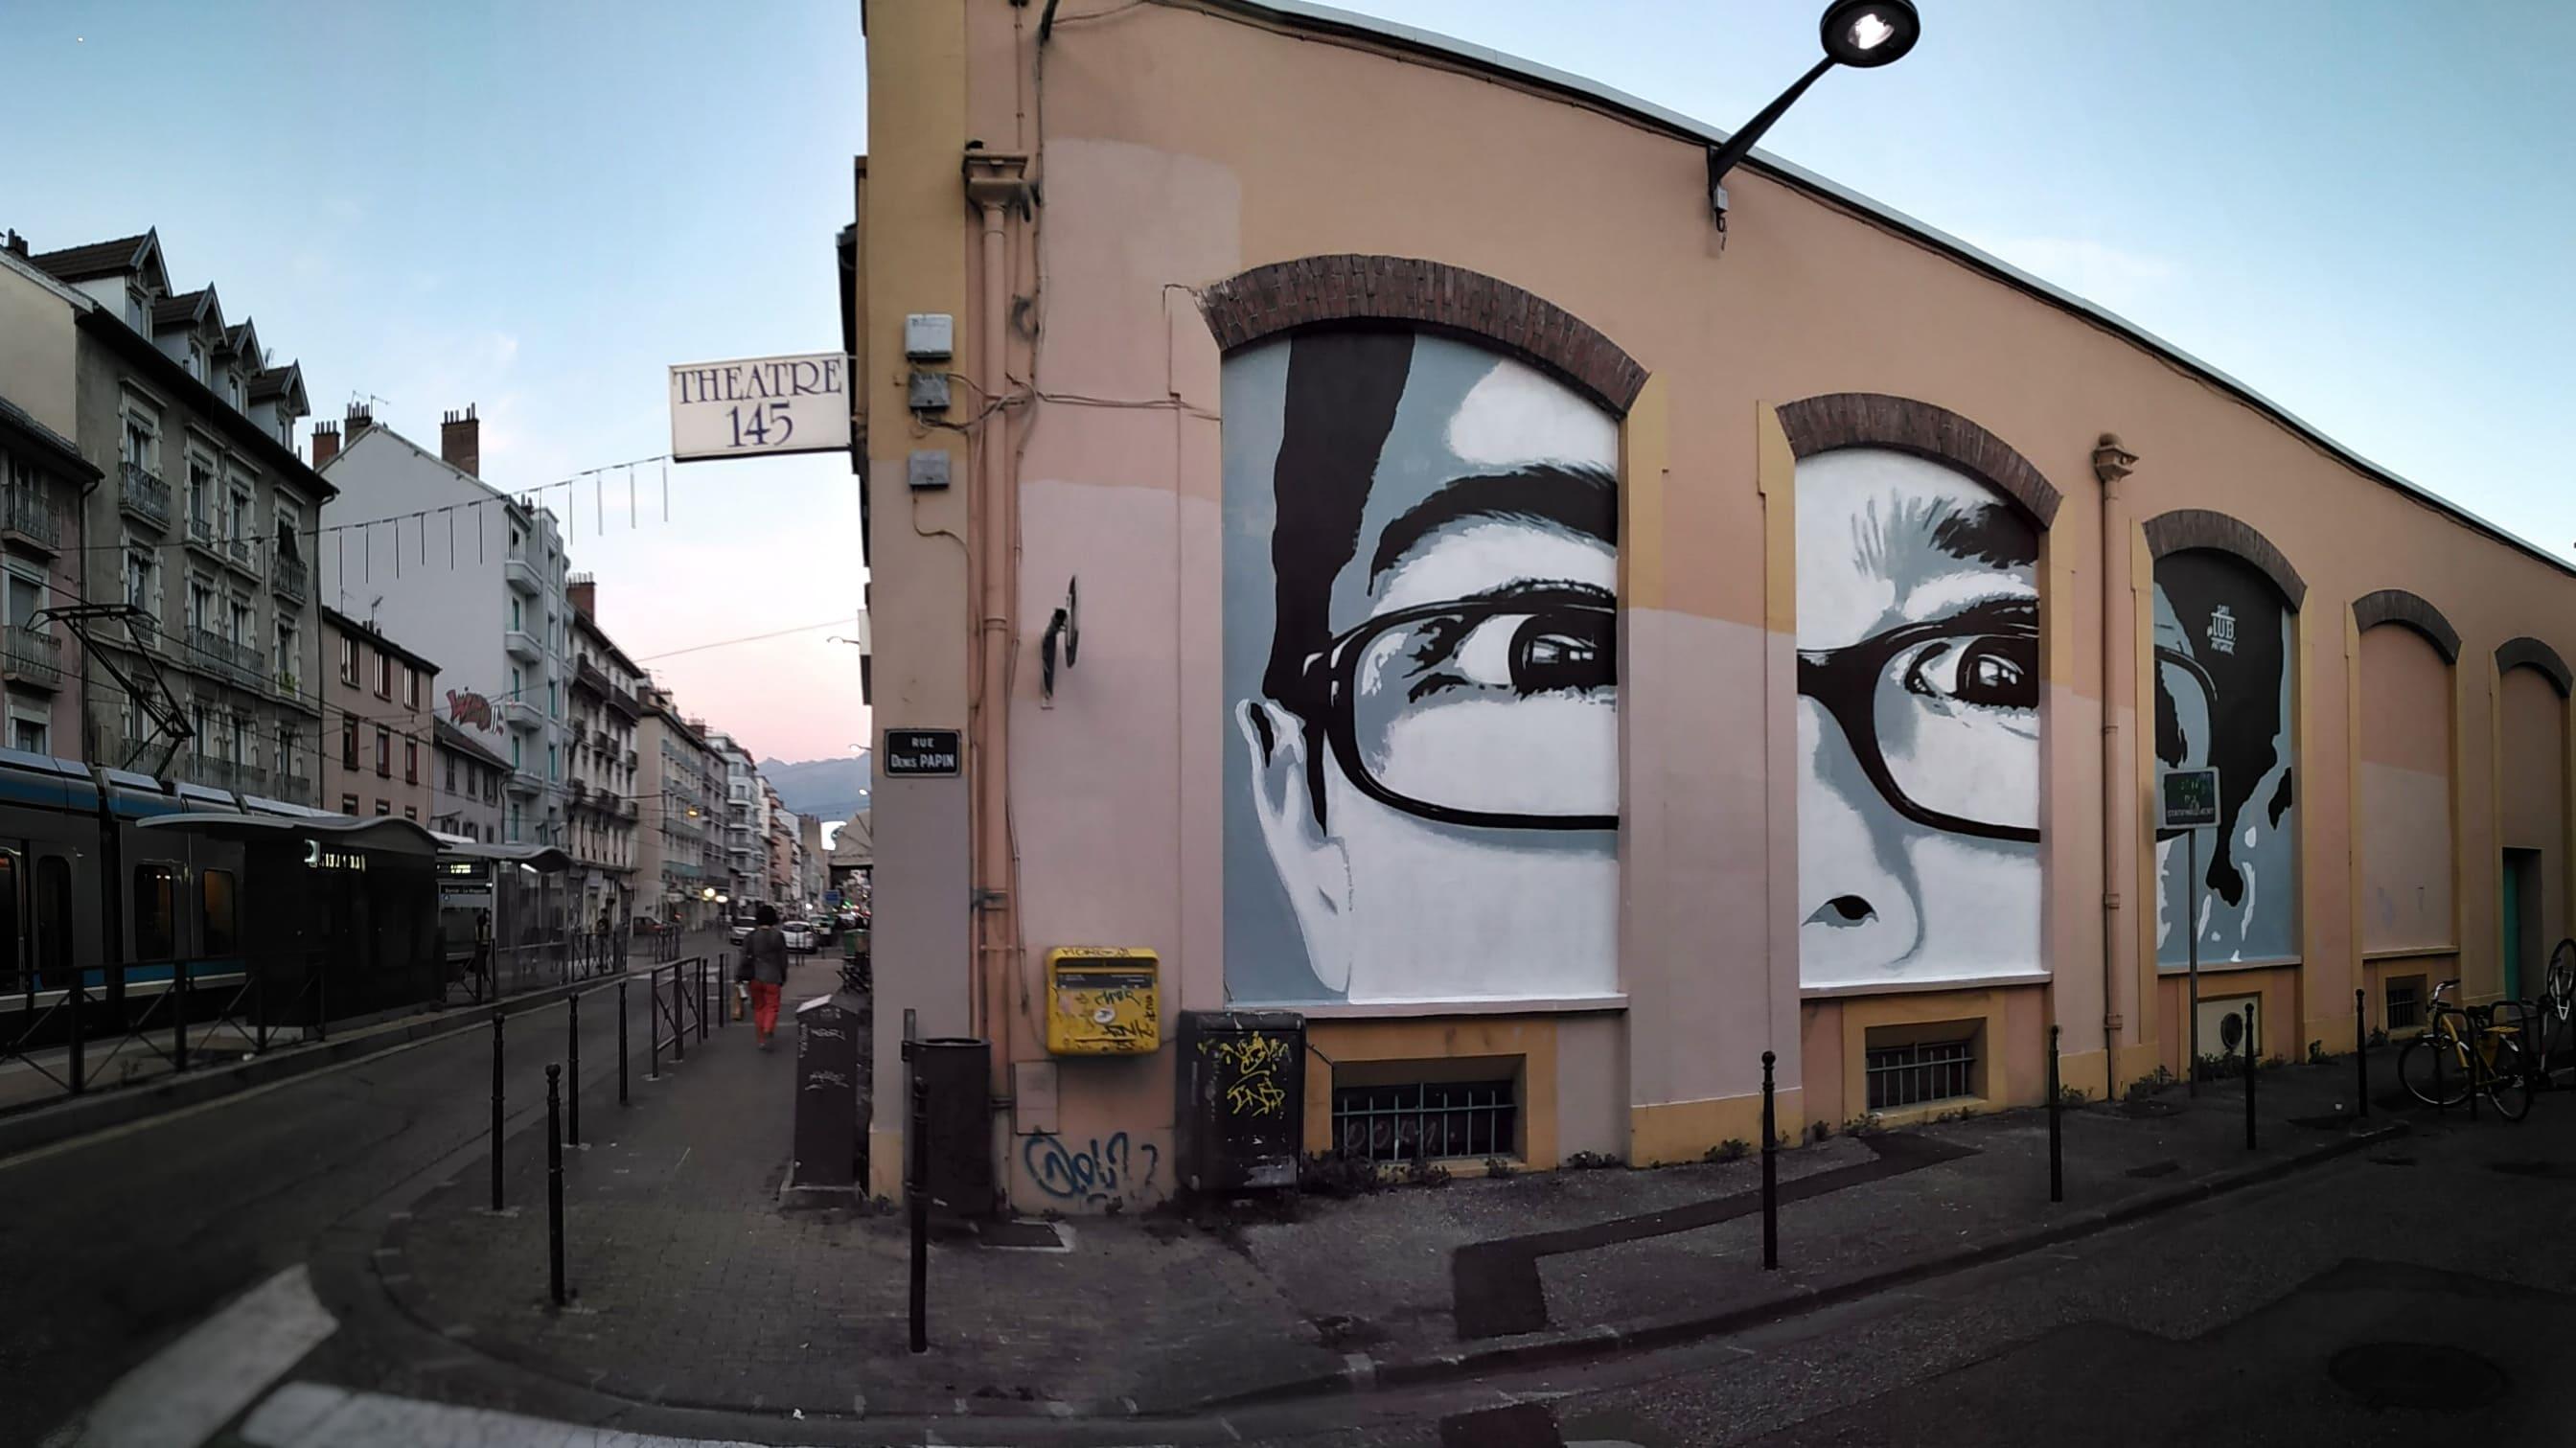 street art anamophose portrait graffiti enfant arcades fresque trompe oeil